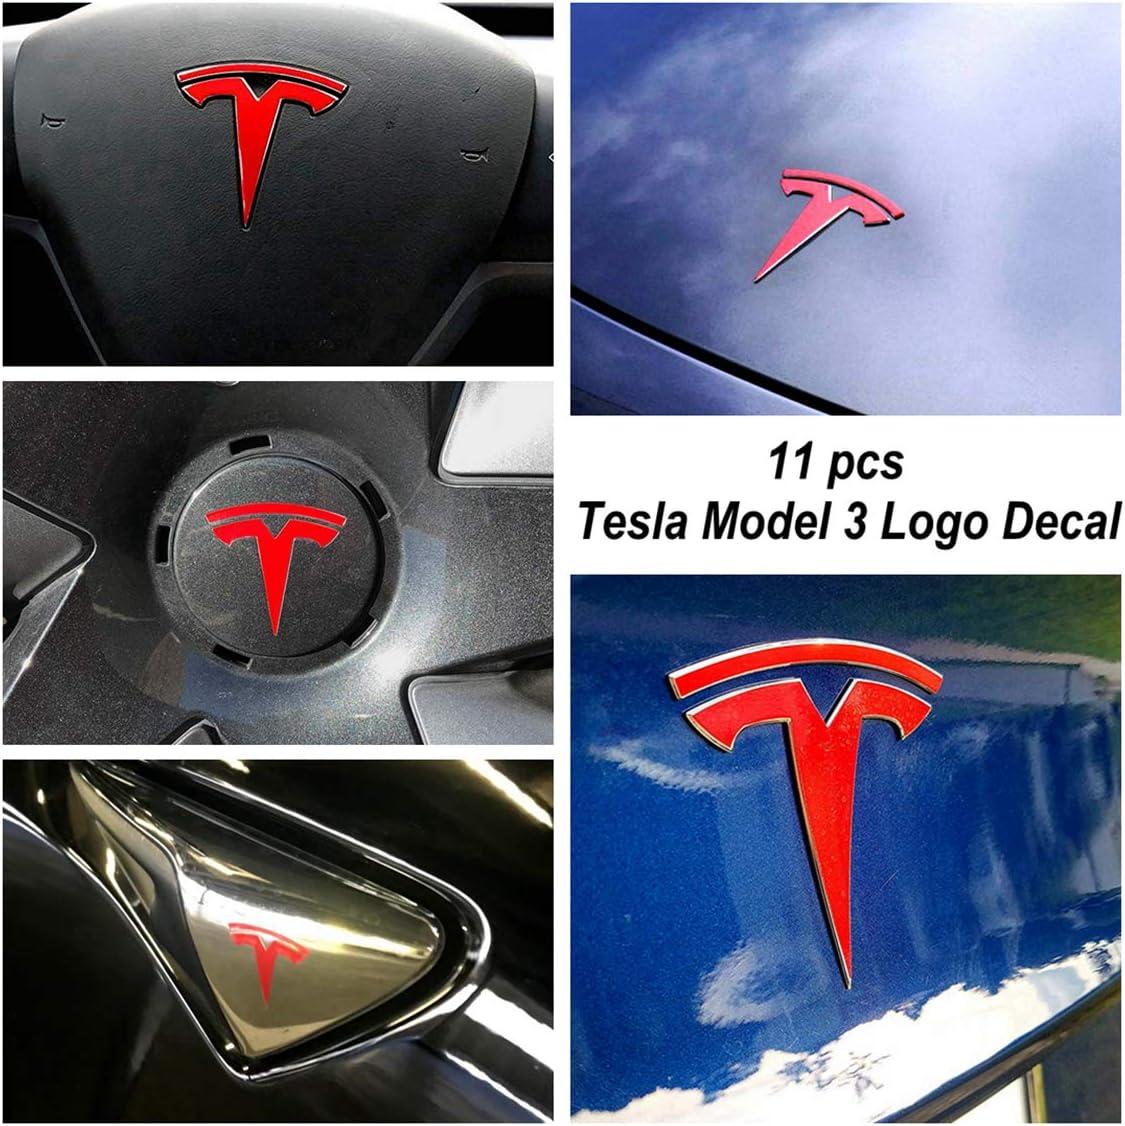 Magicalmai Tesla Model 3 Logo Decal Wrap 11pcs a Set Gloss Red